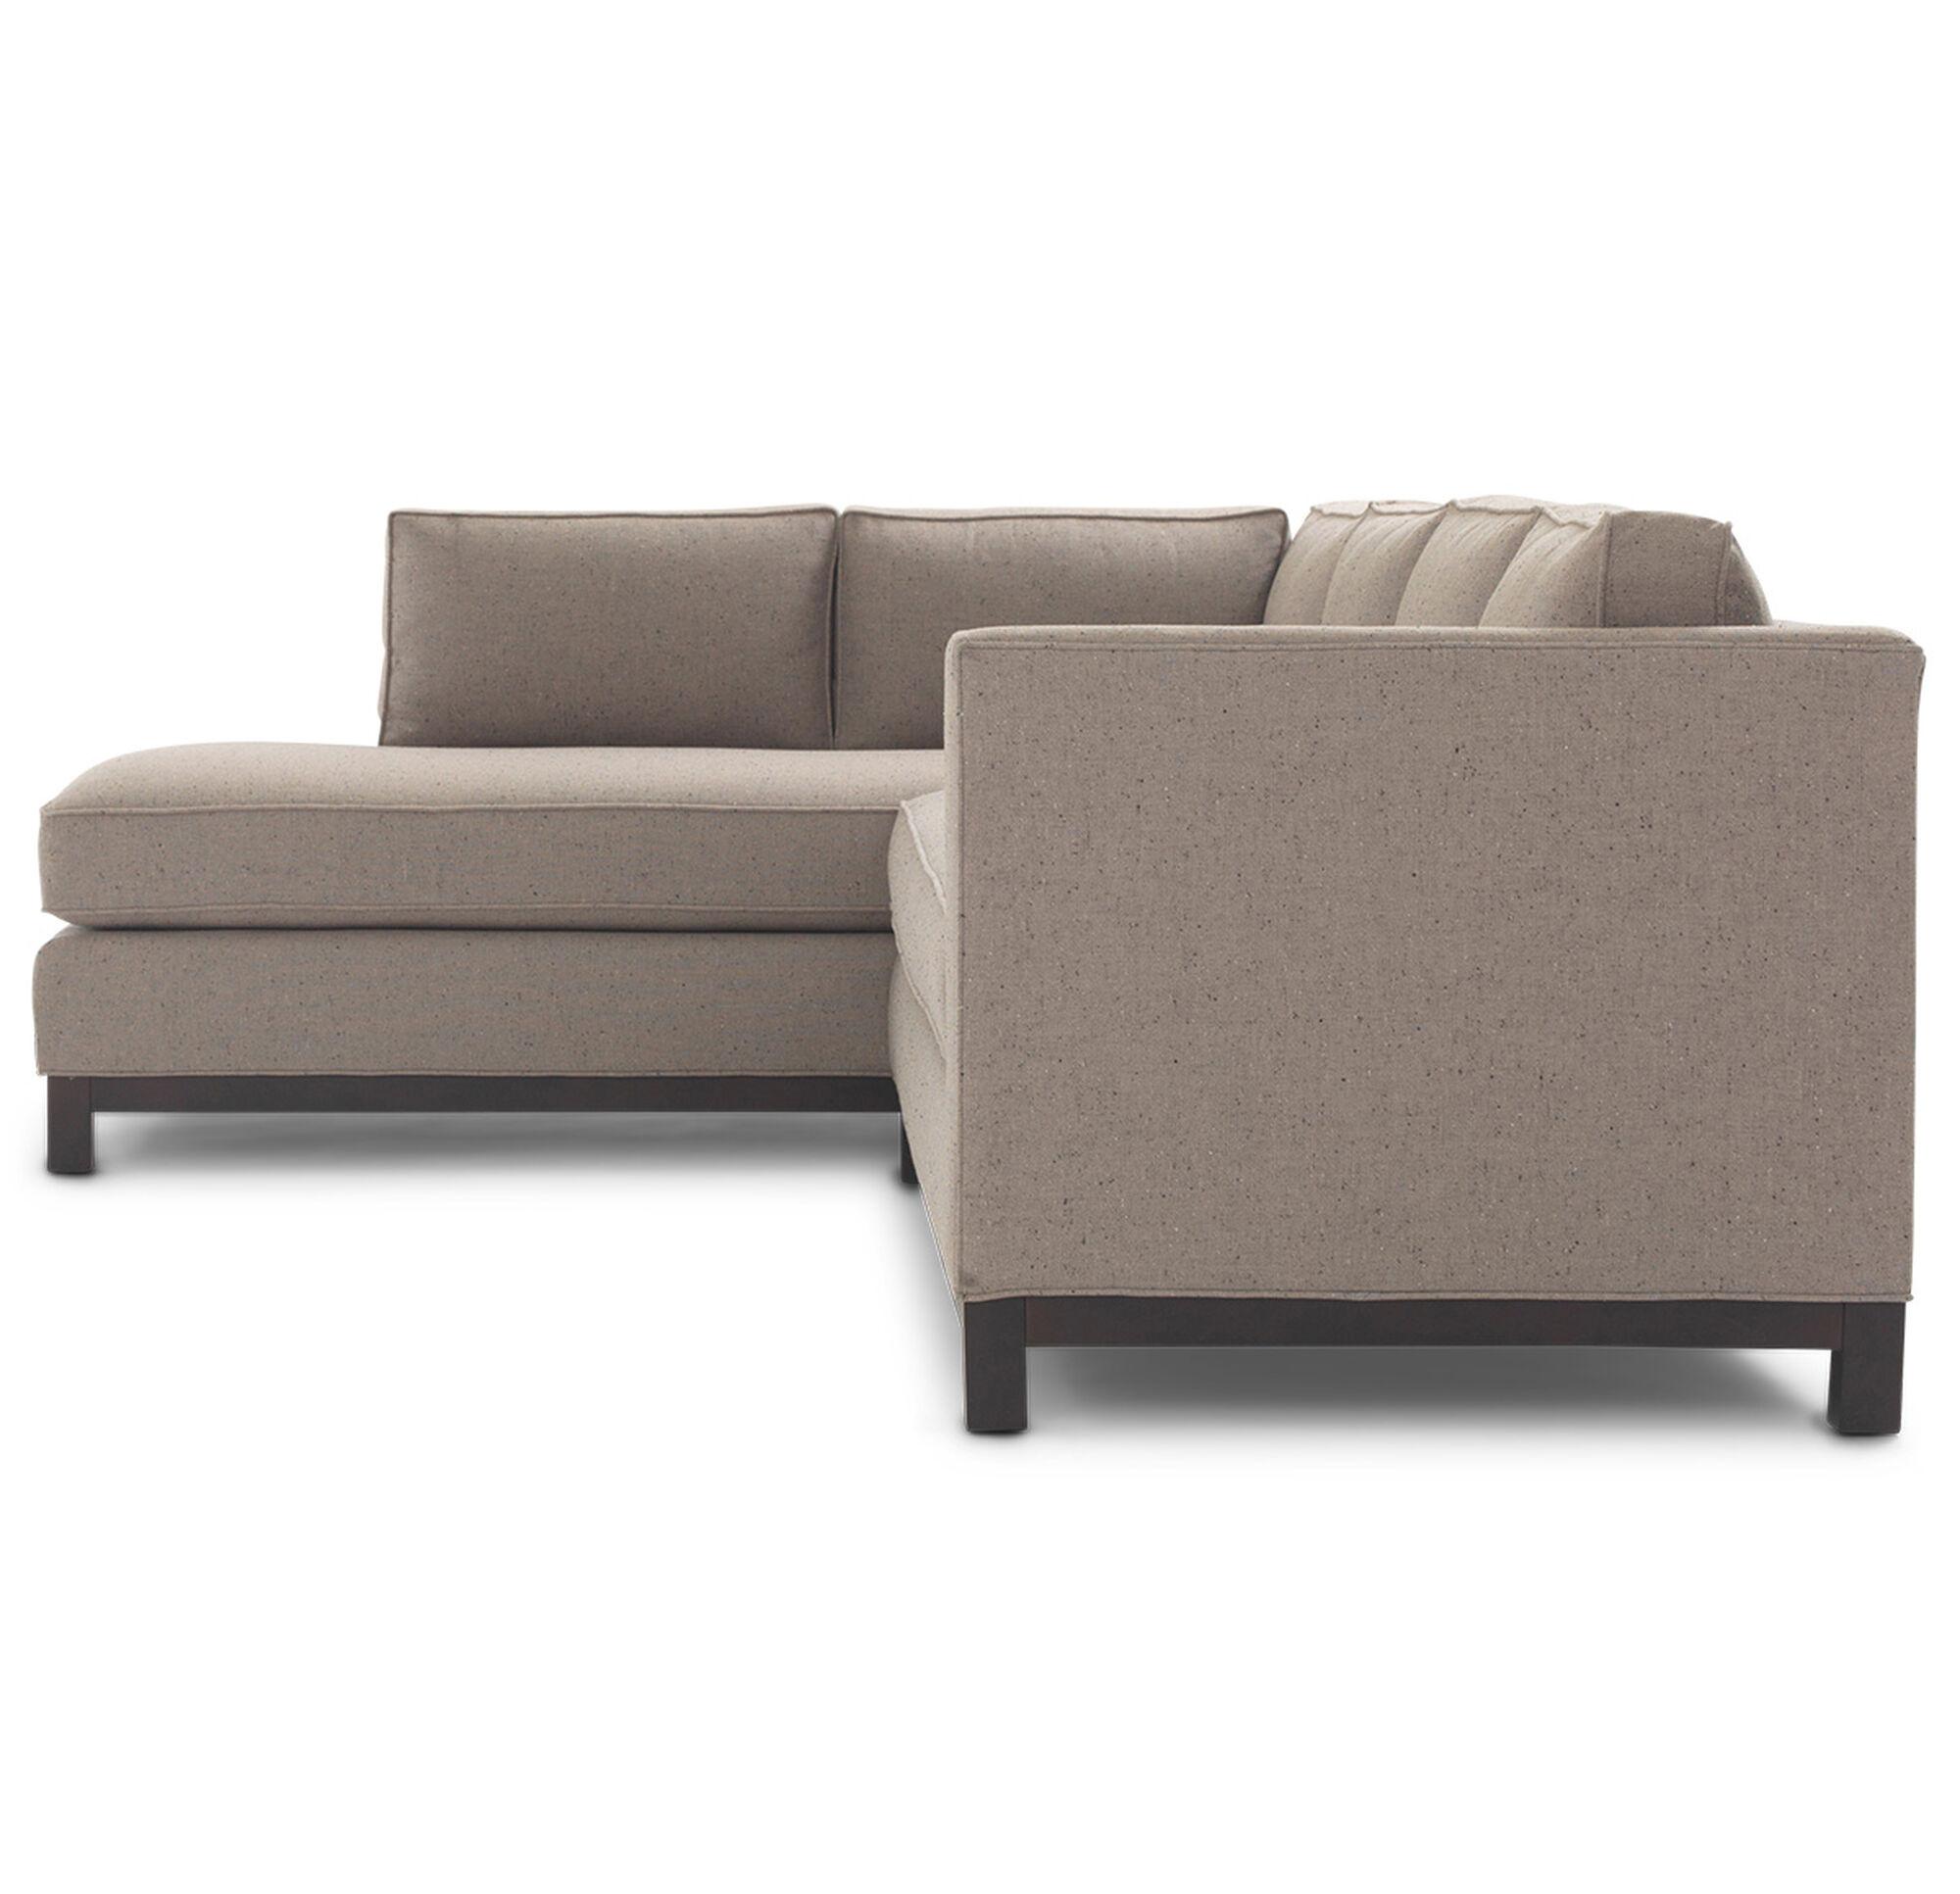 Clifton sectional sofa for Sectional sofa hawaii